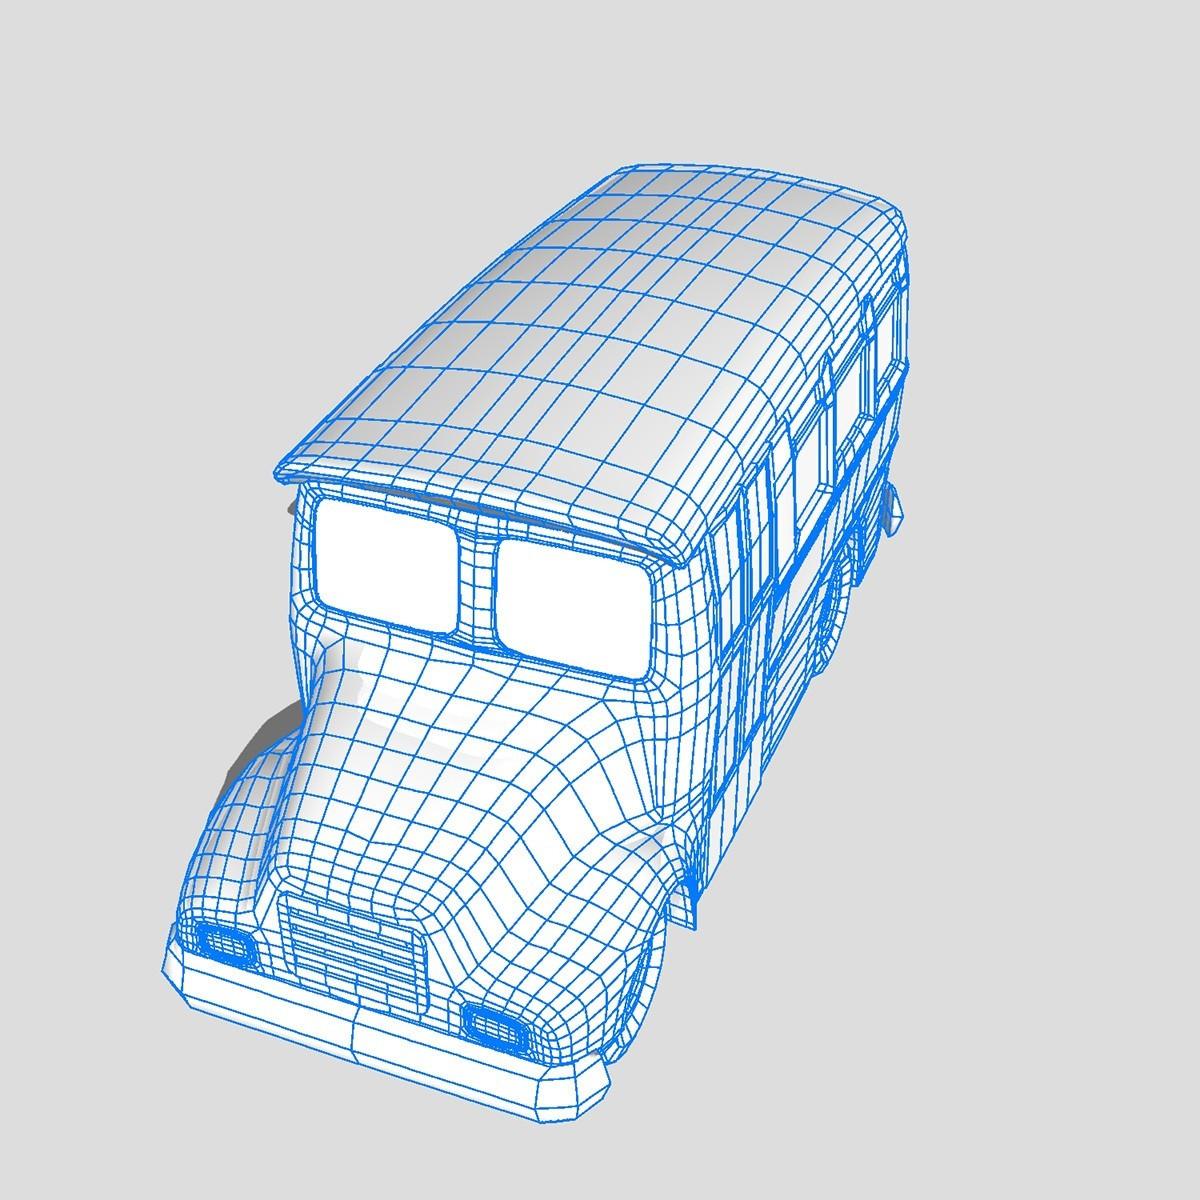 transport_pack_wairframe_0001.jpg Download STL file School Bus • 3D printer design, scifikid